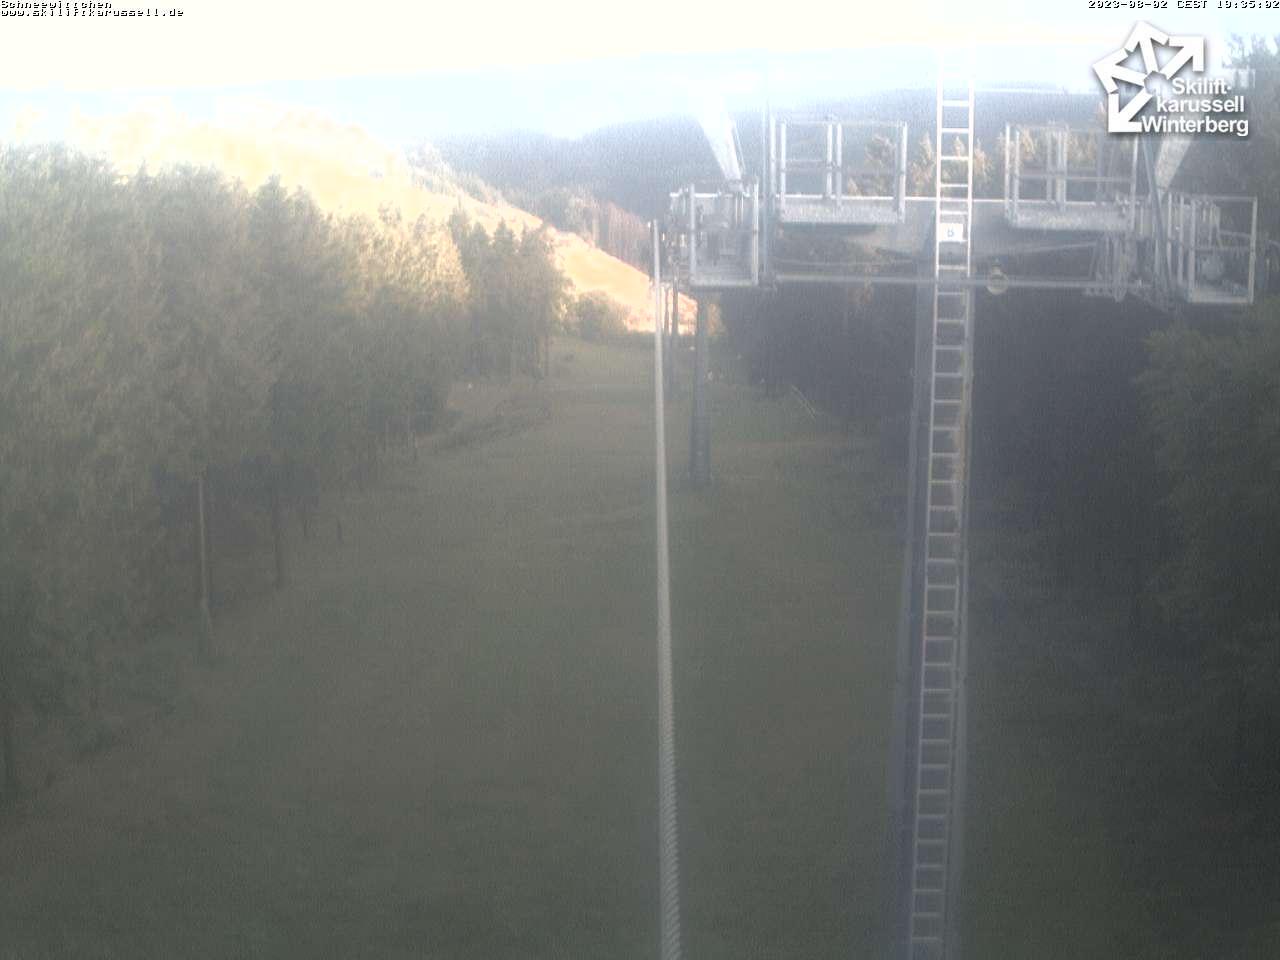 Skiliftkarussell Winterberg - Webcam 7